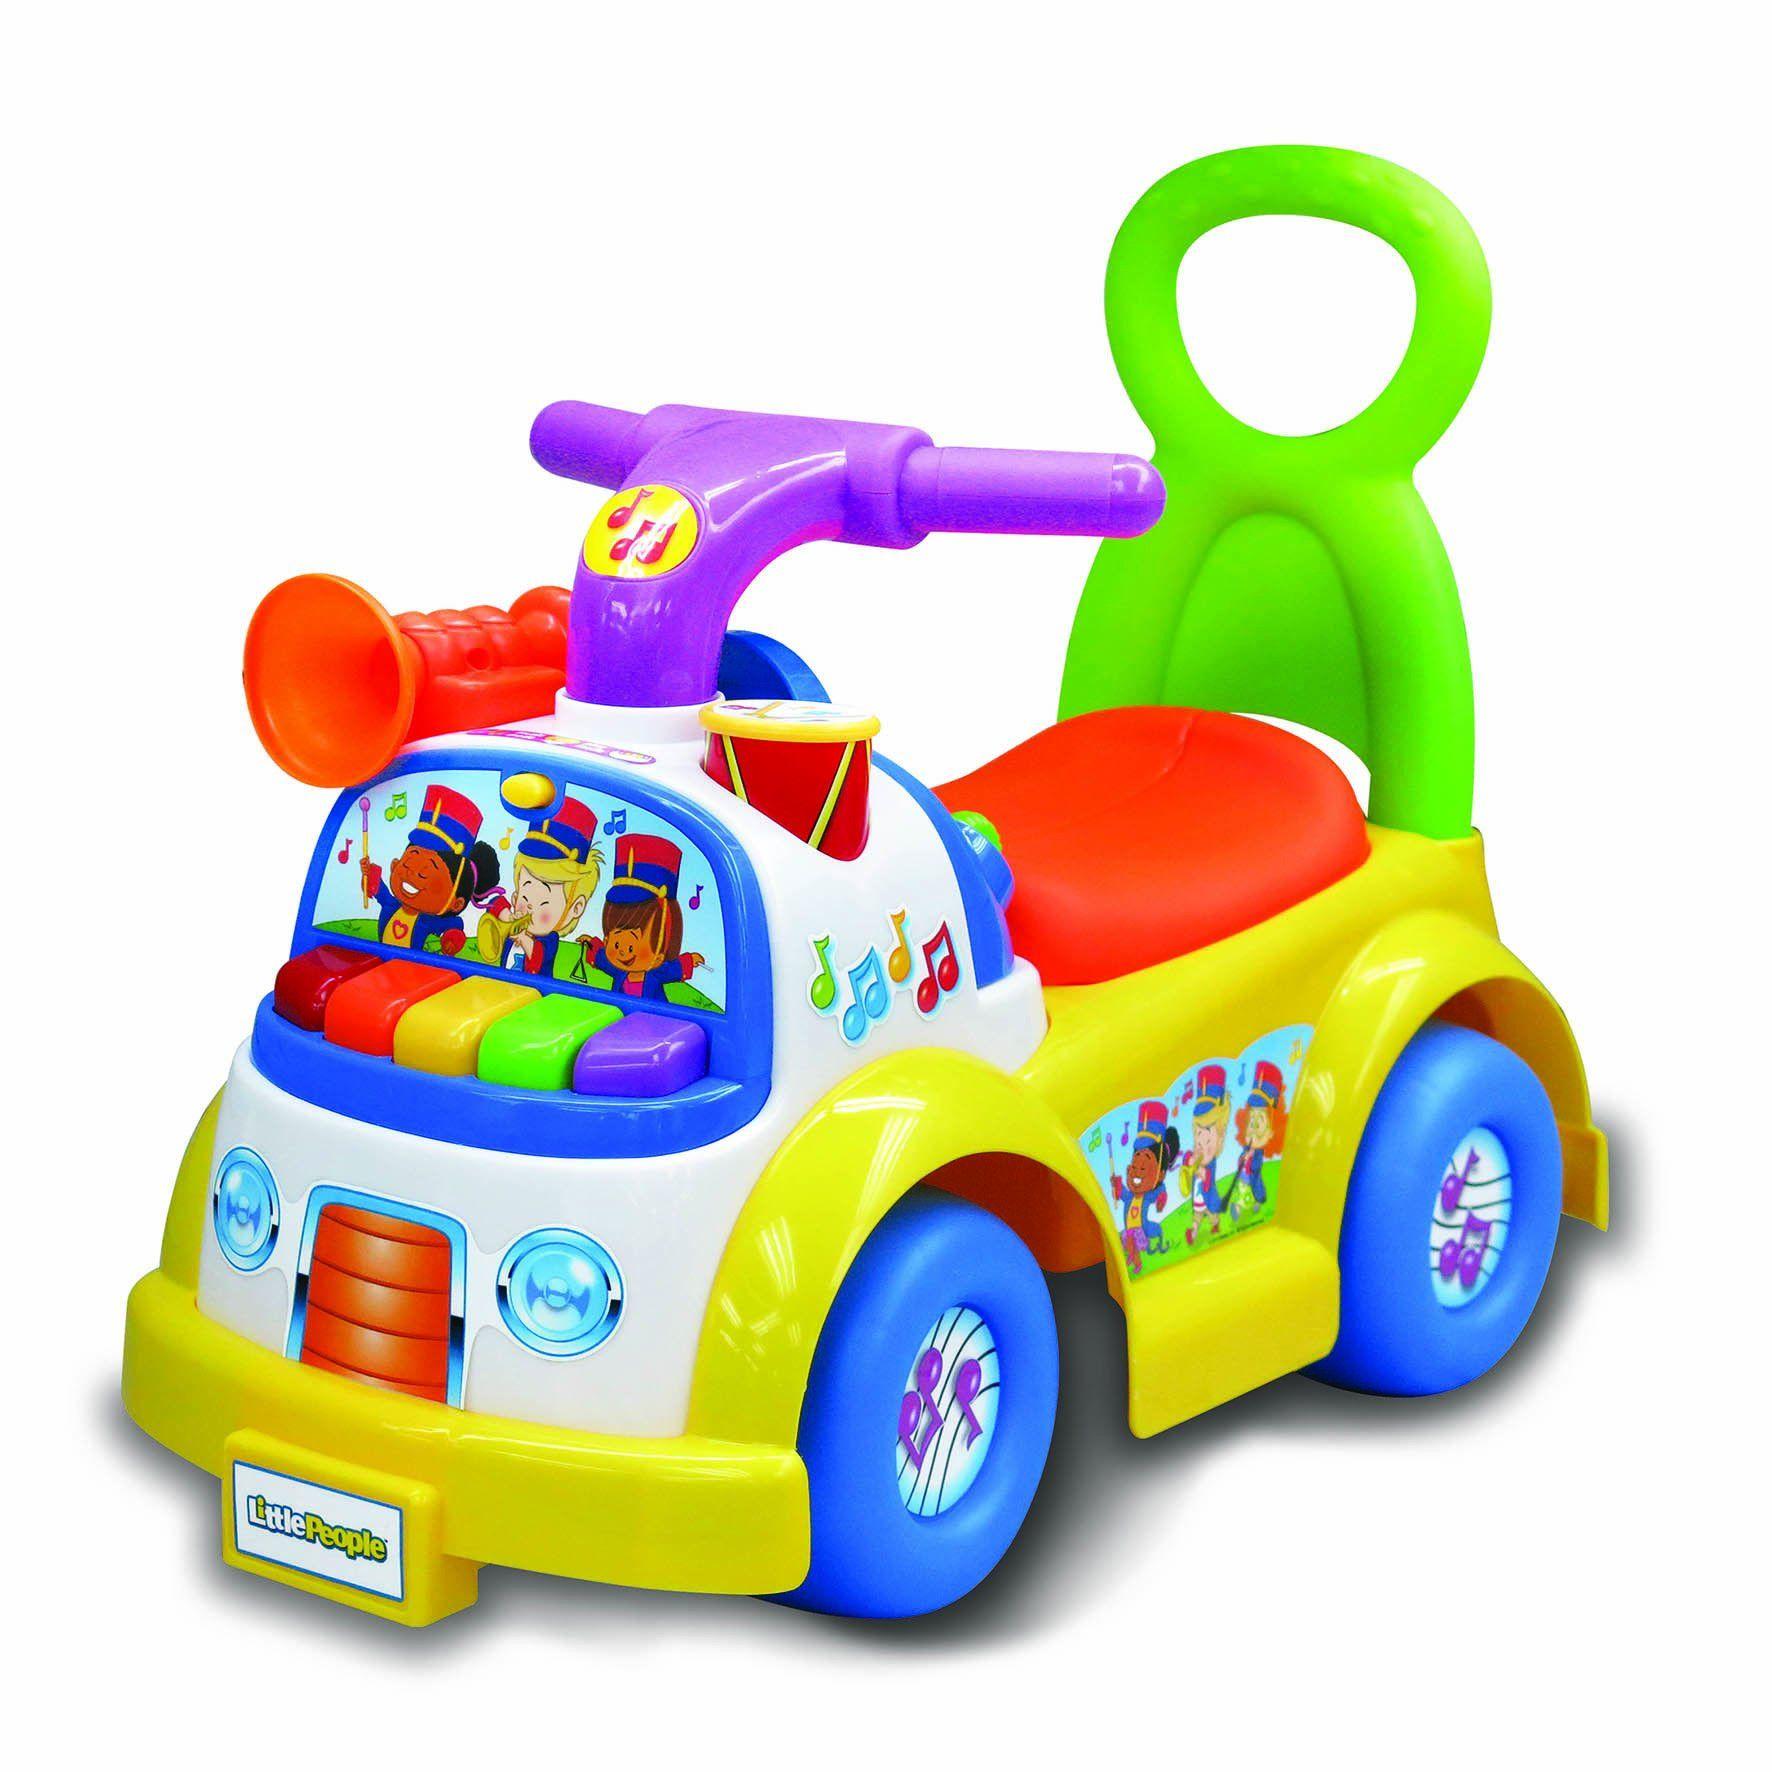 Little car toys  Cool Toys for  year old Boys  Birthday Christmas Gift Ideas